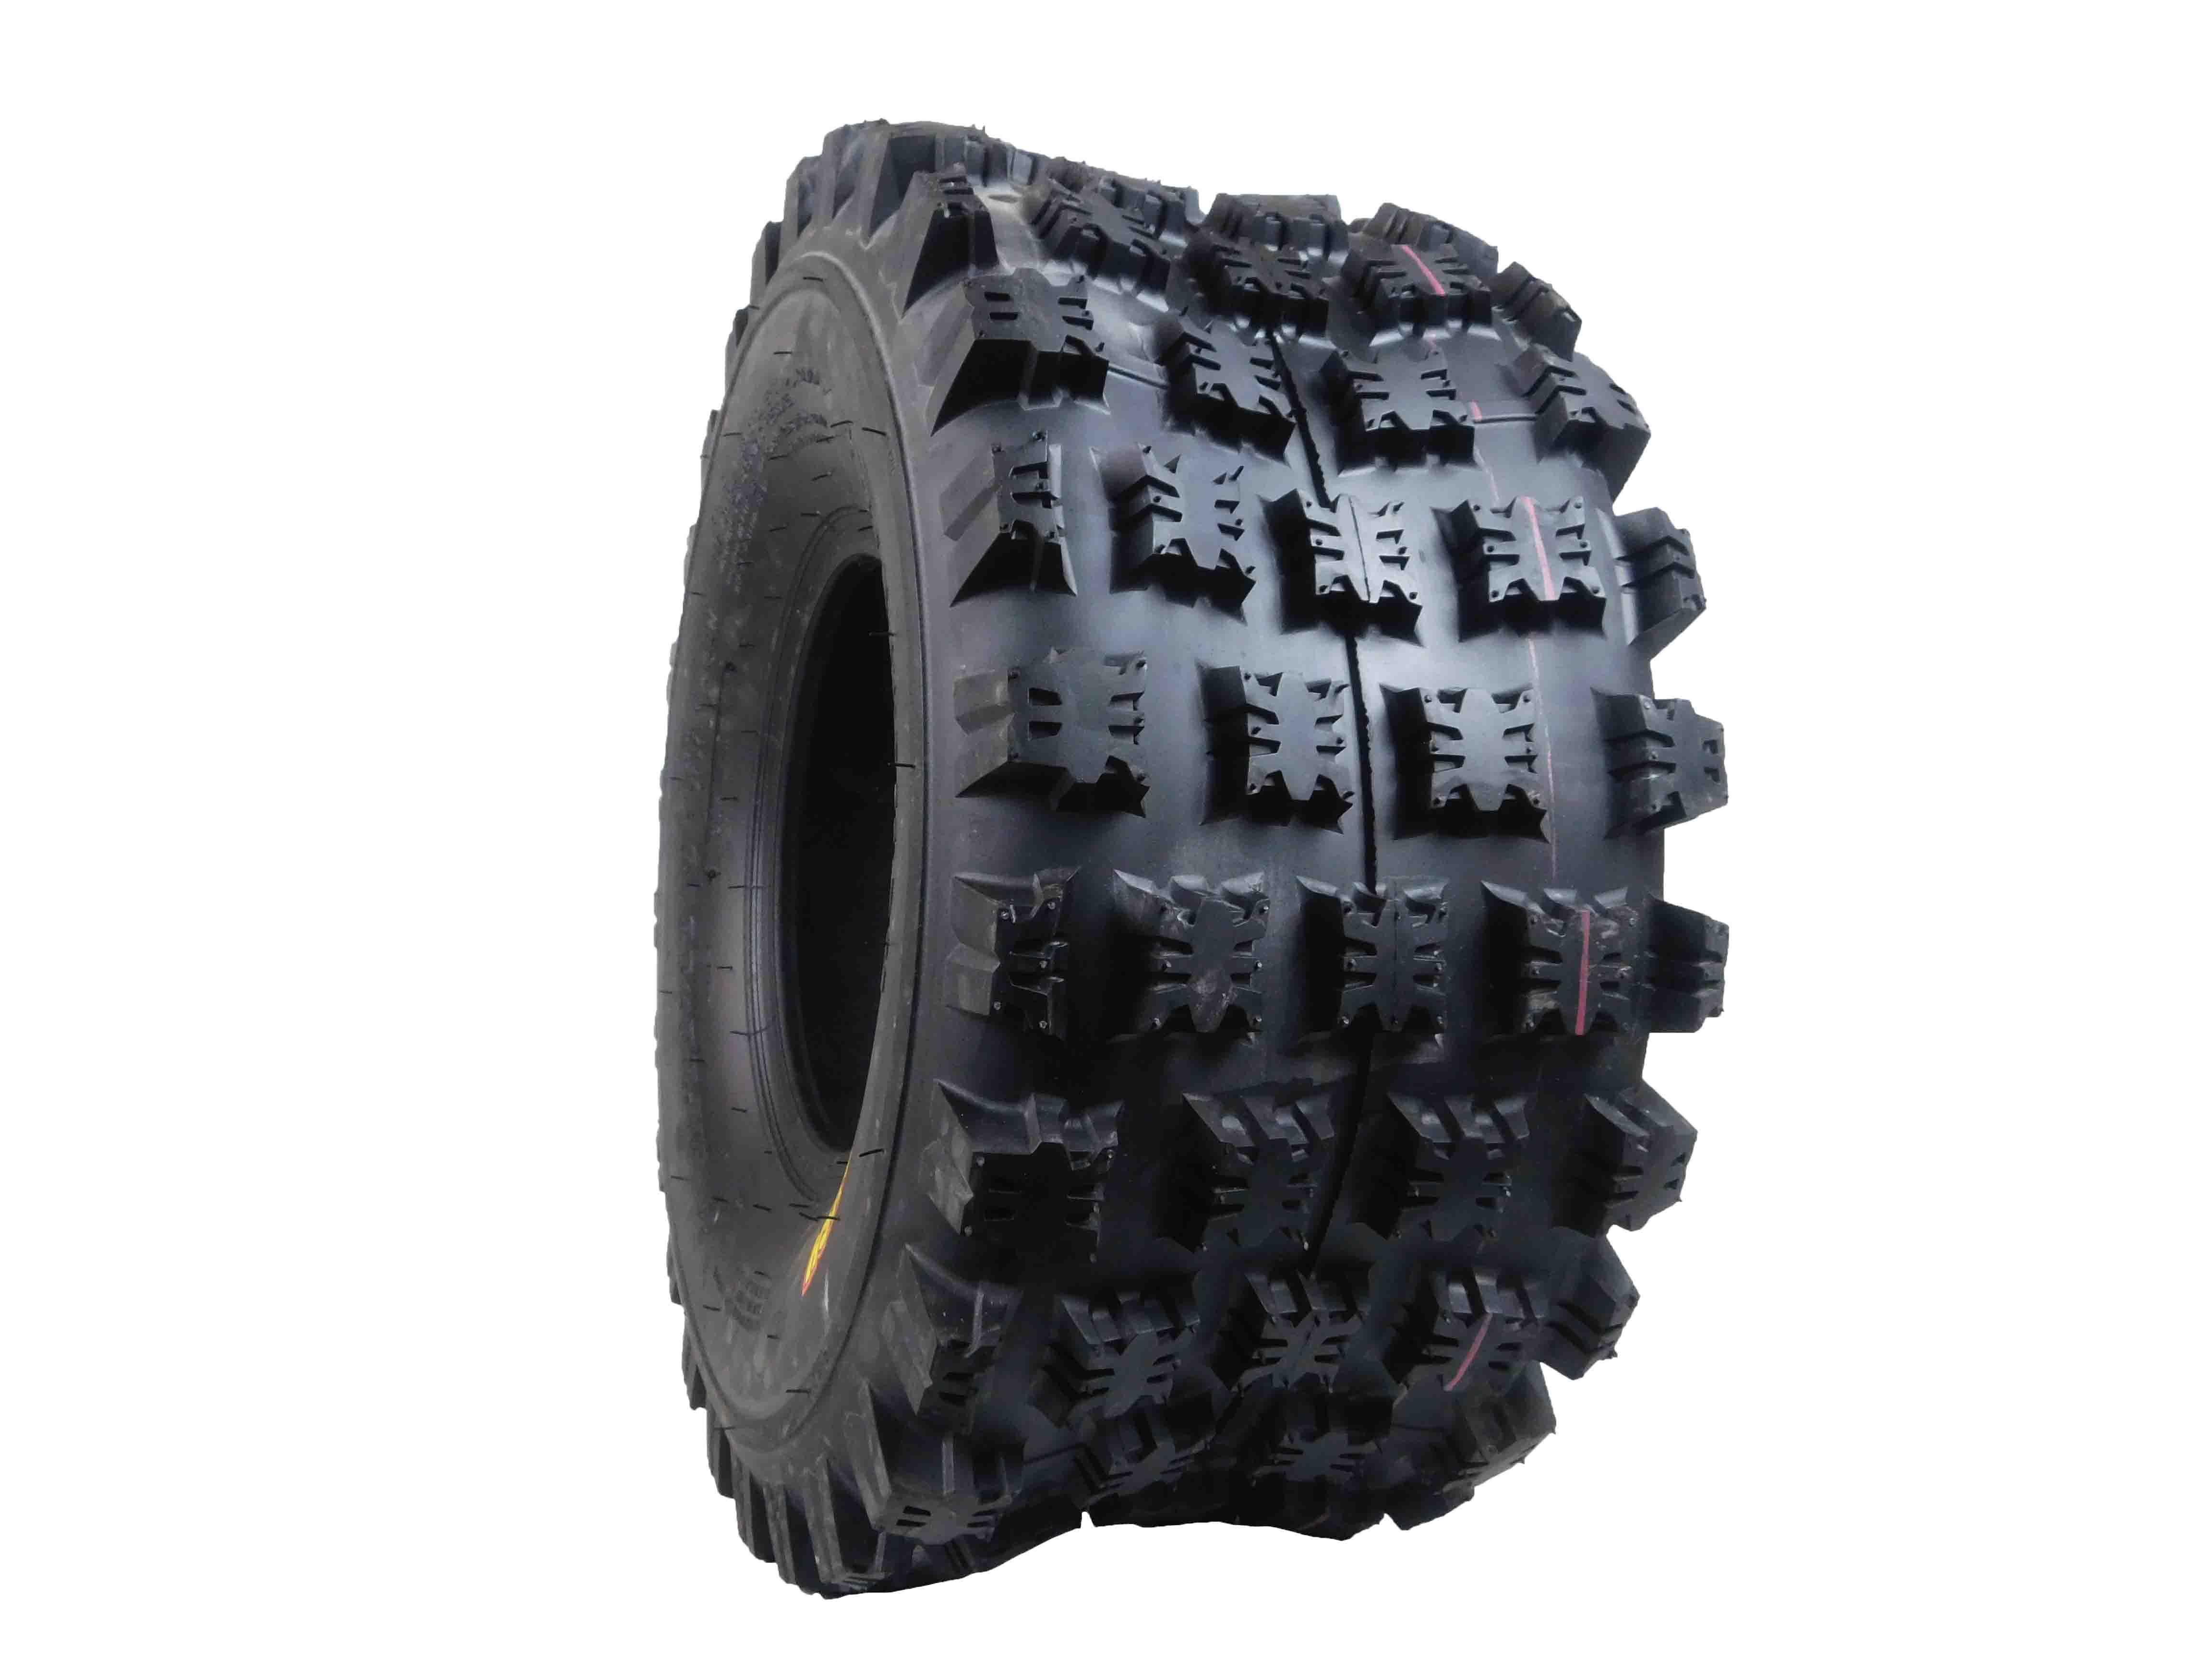 Ambush-22x10-9-ATV-Tire-2-Pack-Rear-4Ply-image-2